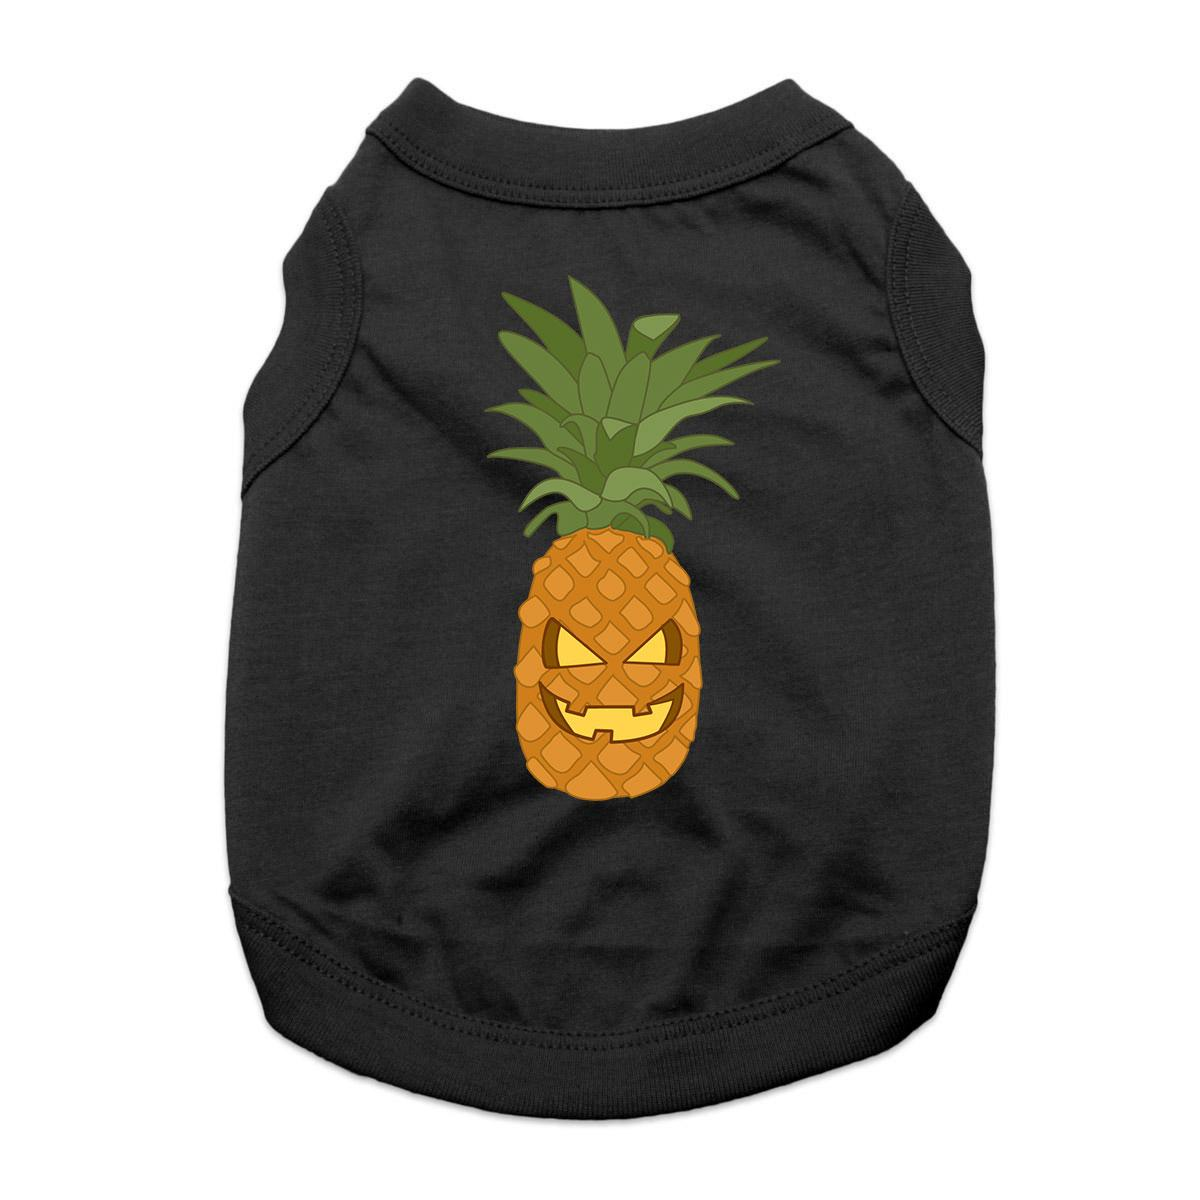 Pineapple Jack-O-Lantern Dog Shirt - Black